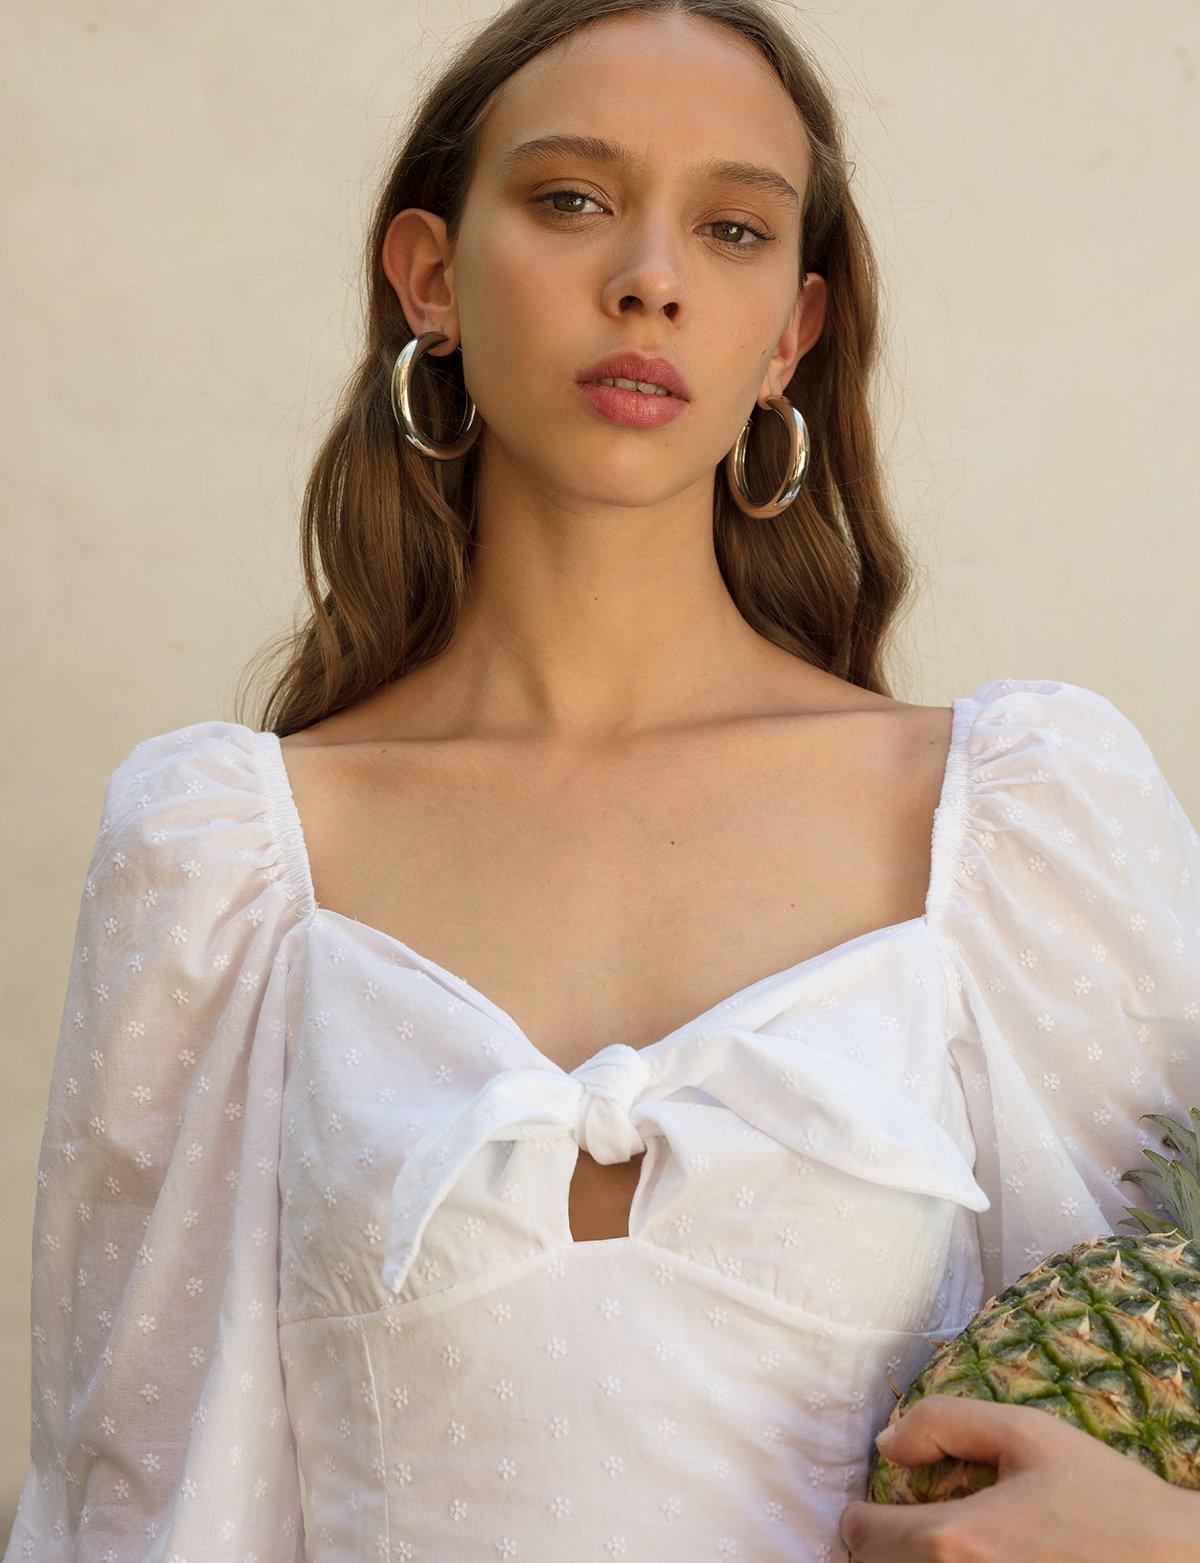 sweetheart-neckline-dress.jpg